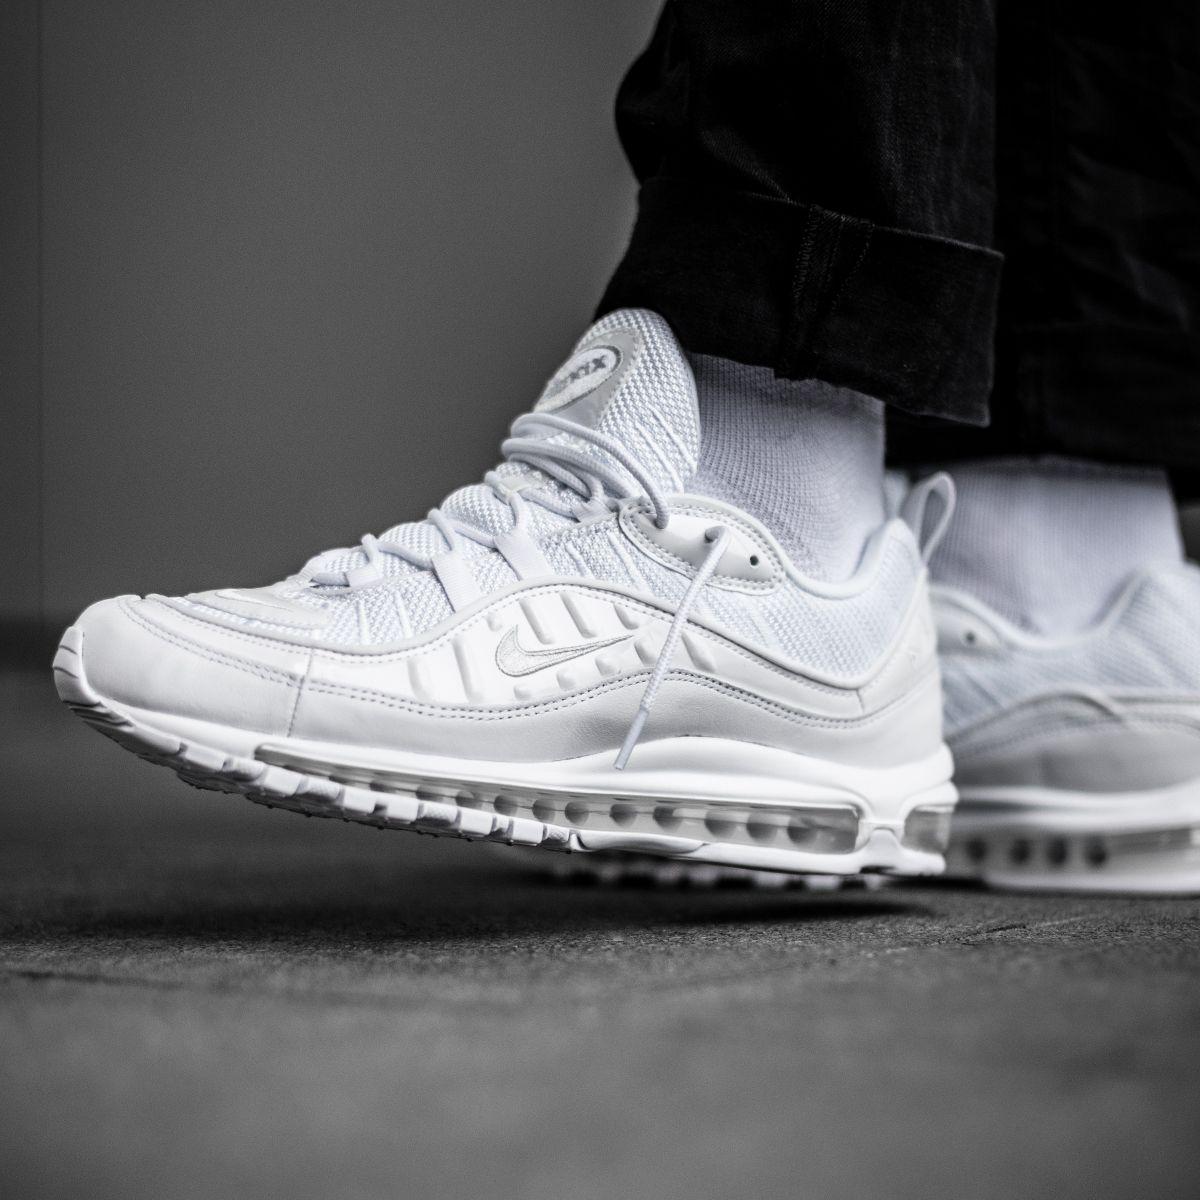 sports shoes 1b6ce bdd89 2019 的 Crispy clean! The Nike Air Max 98 in triple white is ...